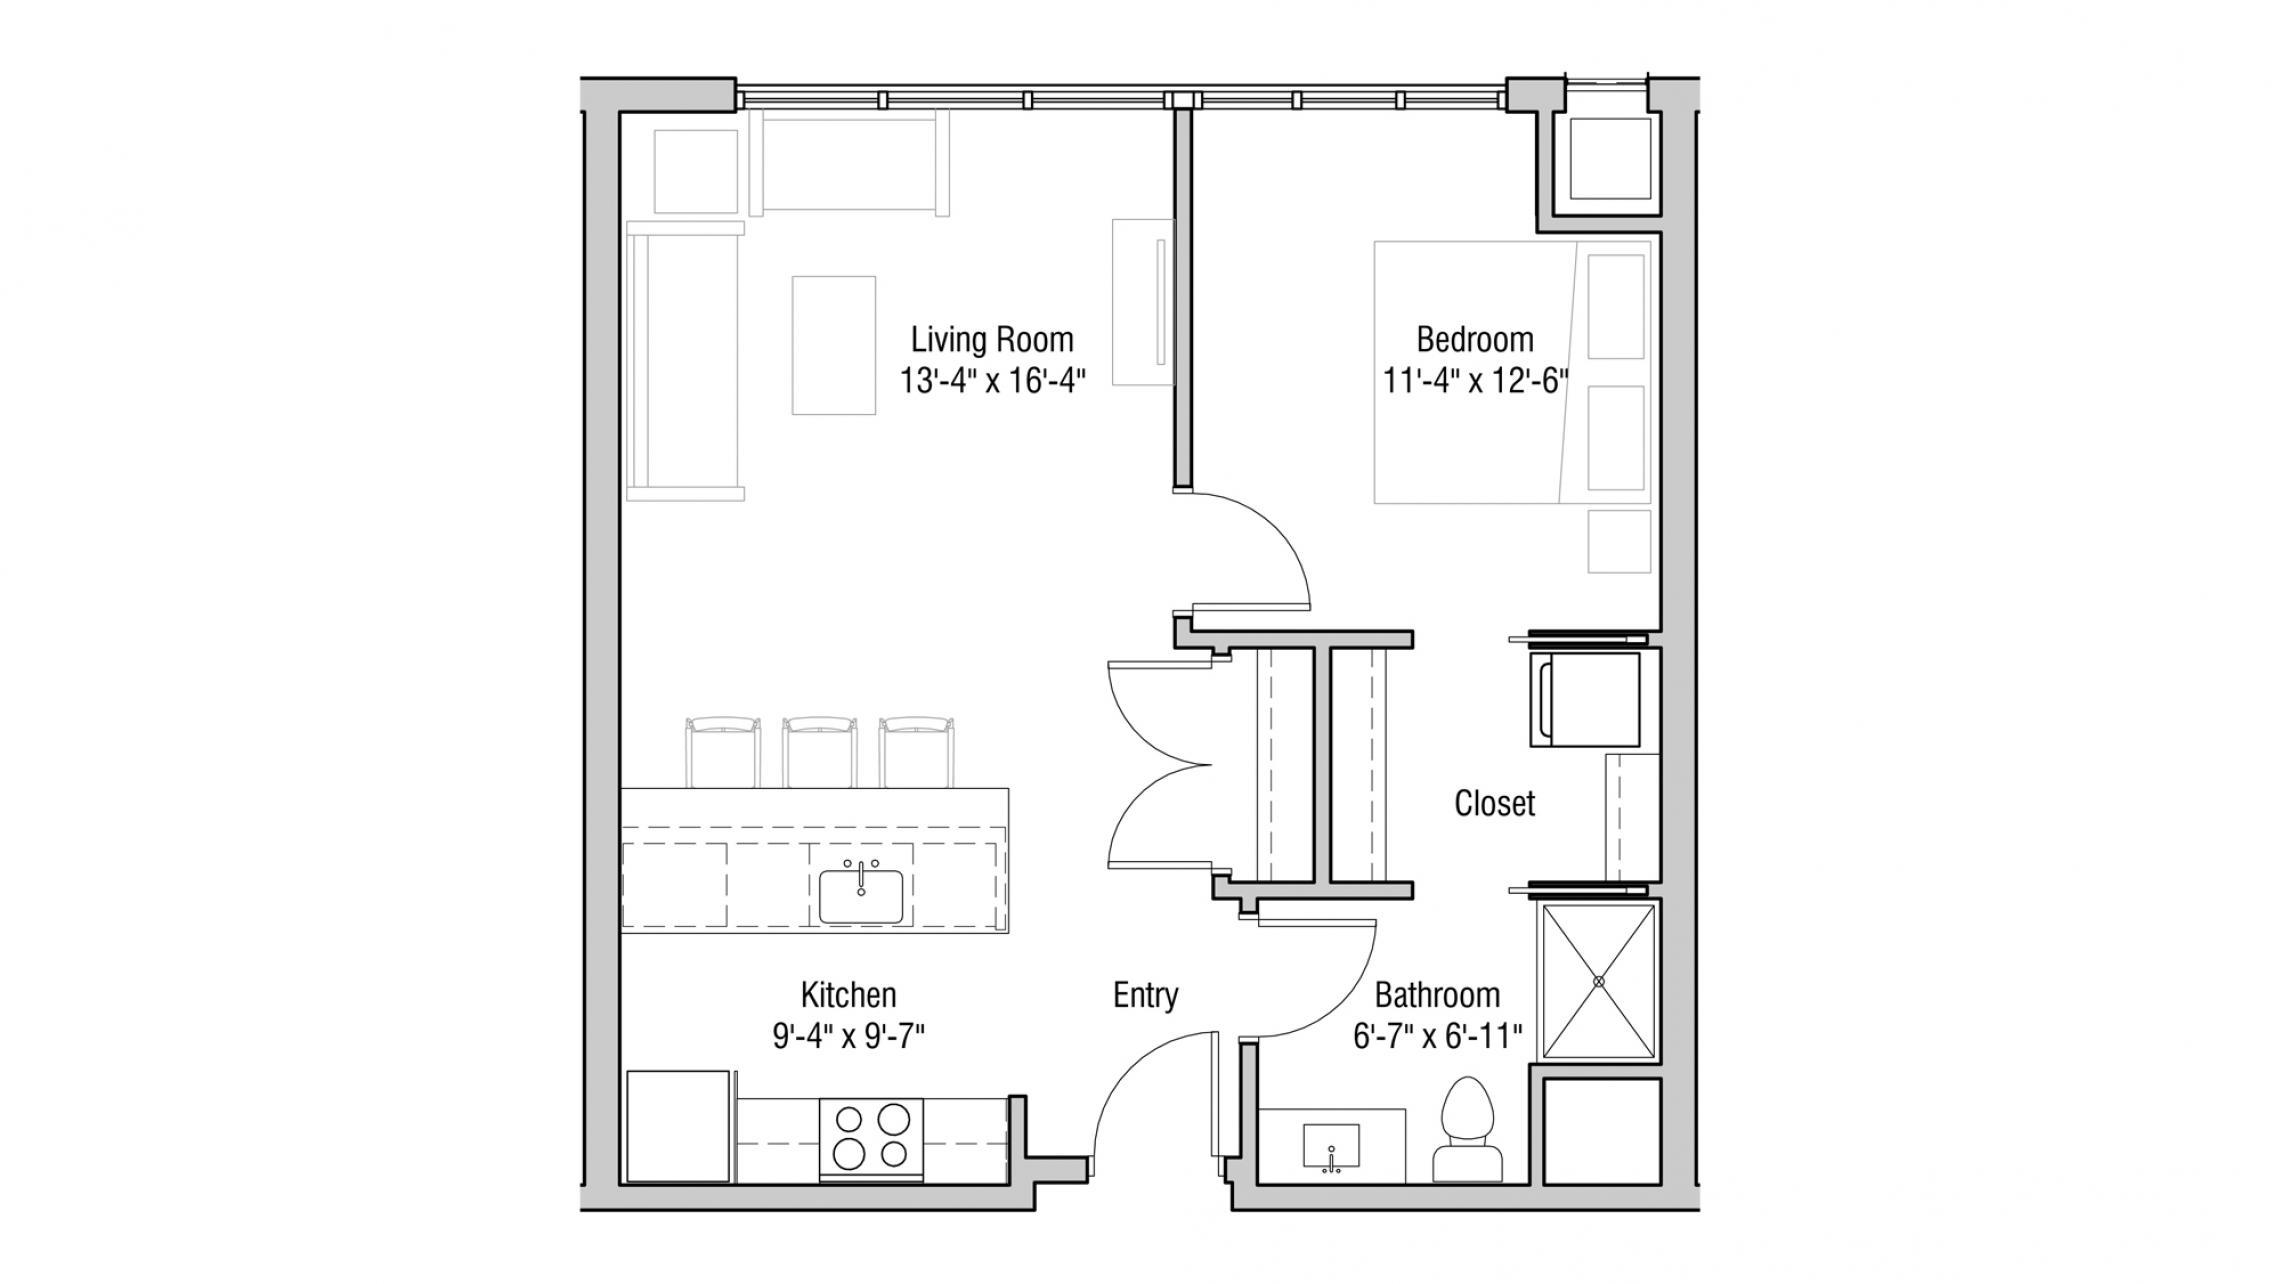 ULI Quarter Row 419 - One Bedroom, One Bathroom